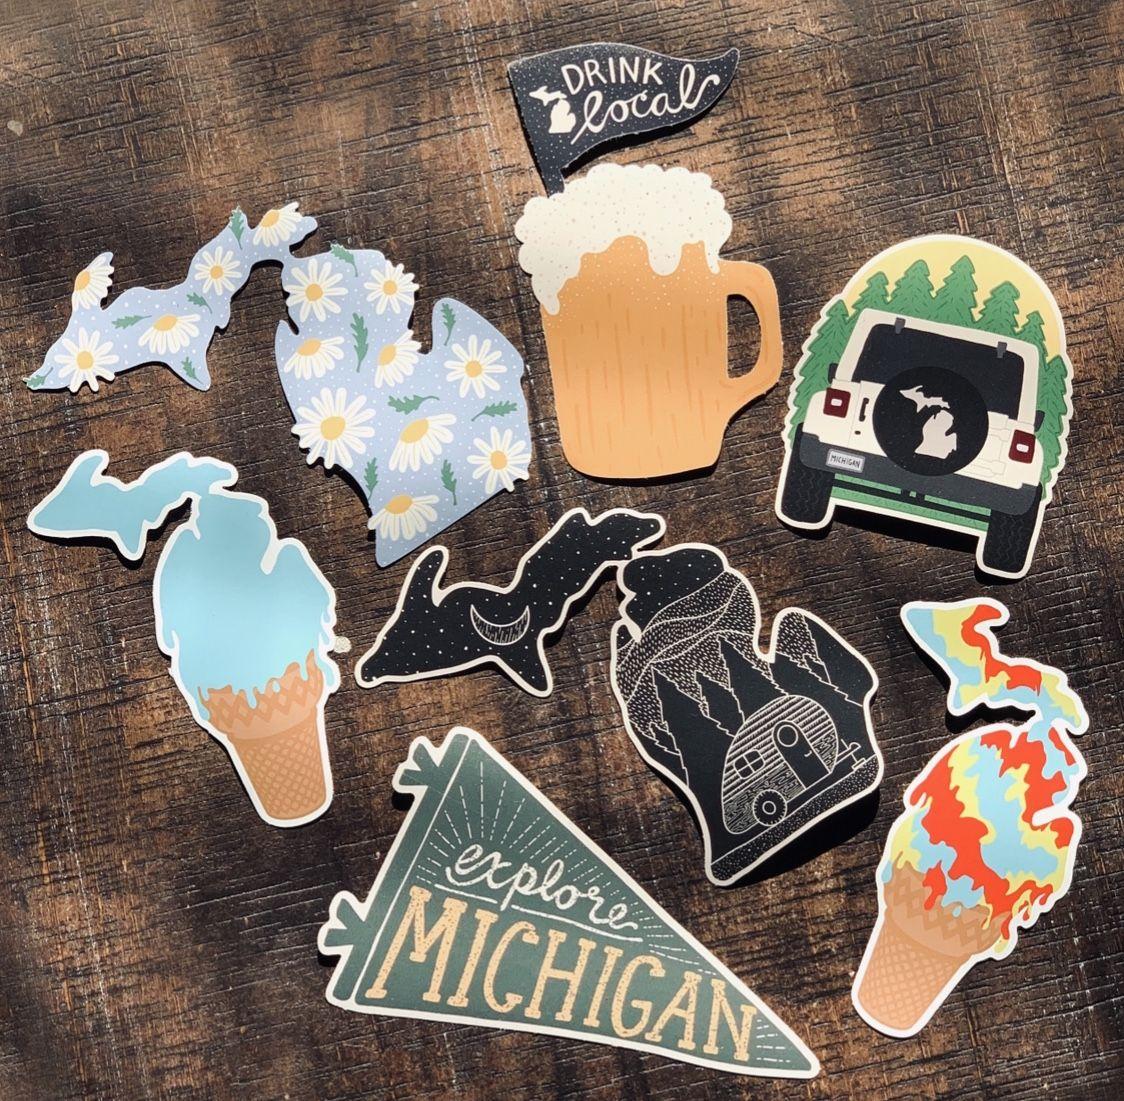 Stuck On Michigan Stickers Michigan Sticker Michigan Gifts Craft Stickers [ 1101 x 1124 Pixel ]